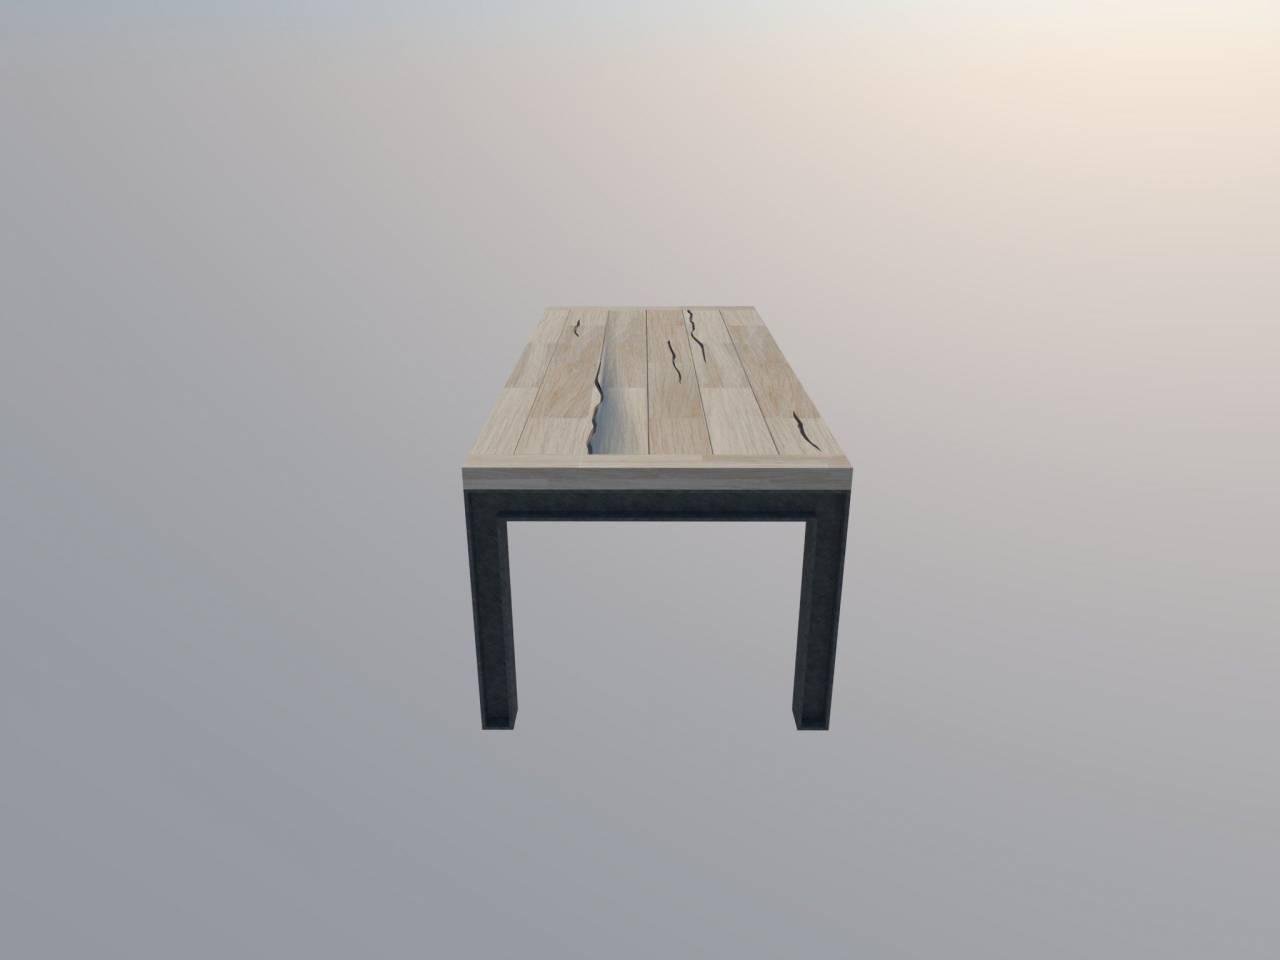 H-profiel stalen frame tafel stalen frame houten blad